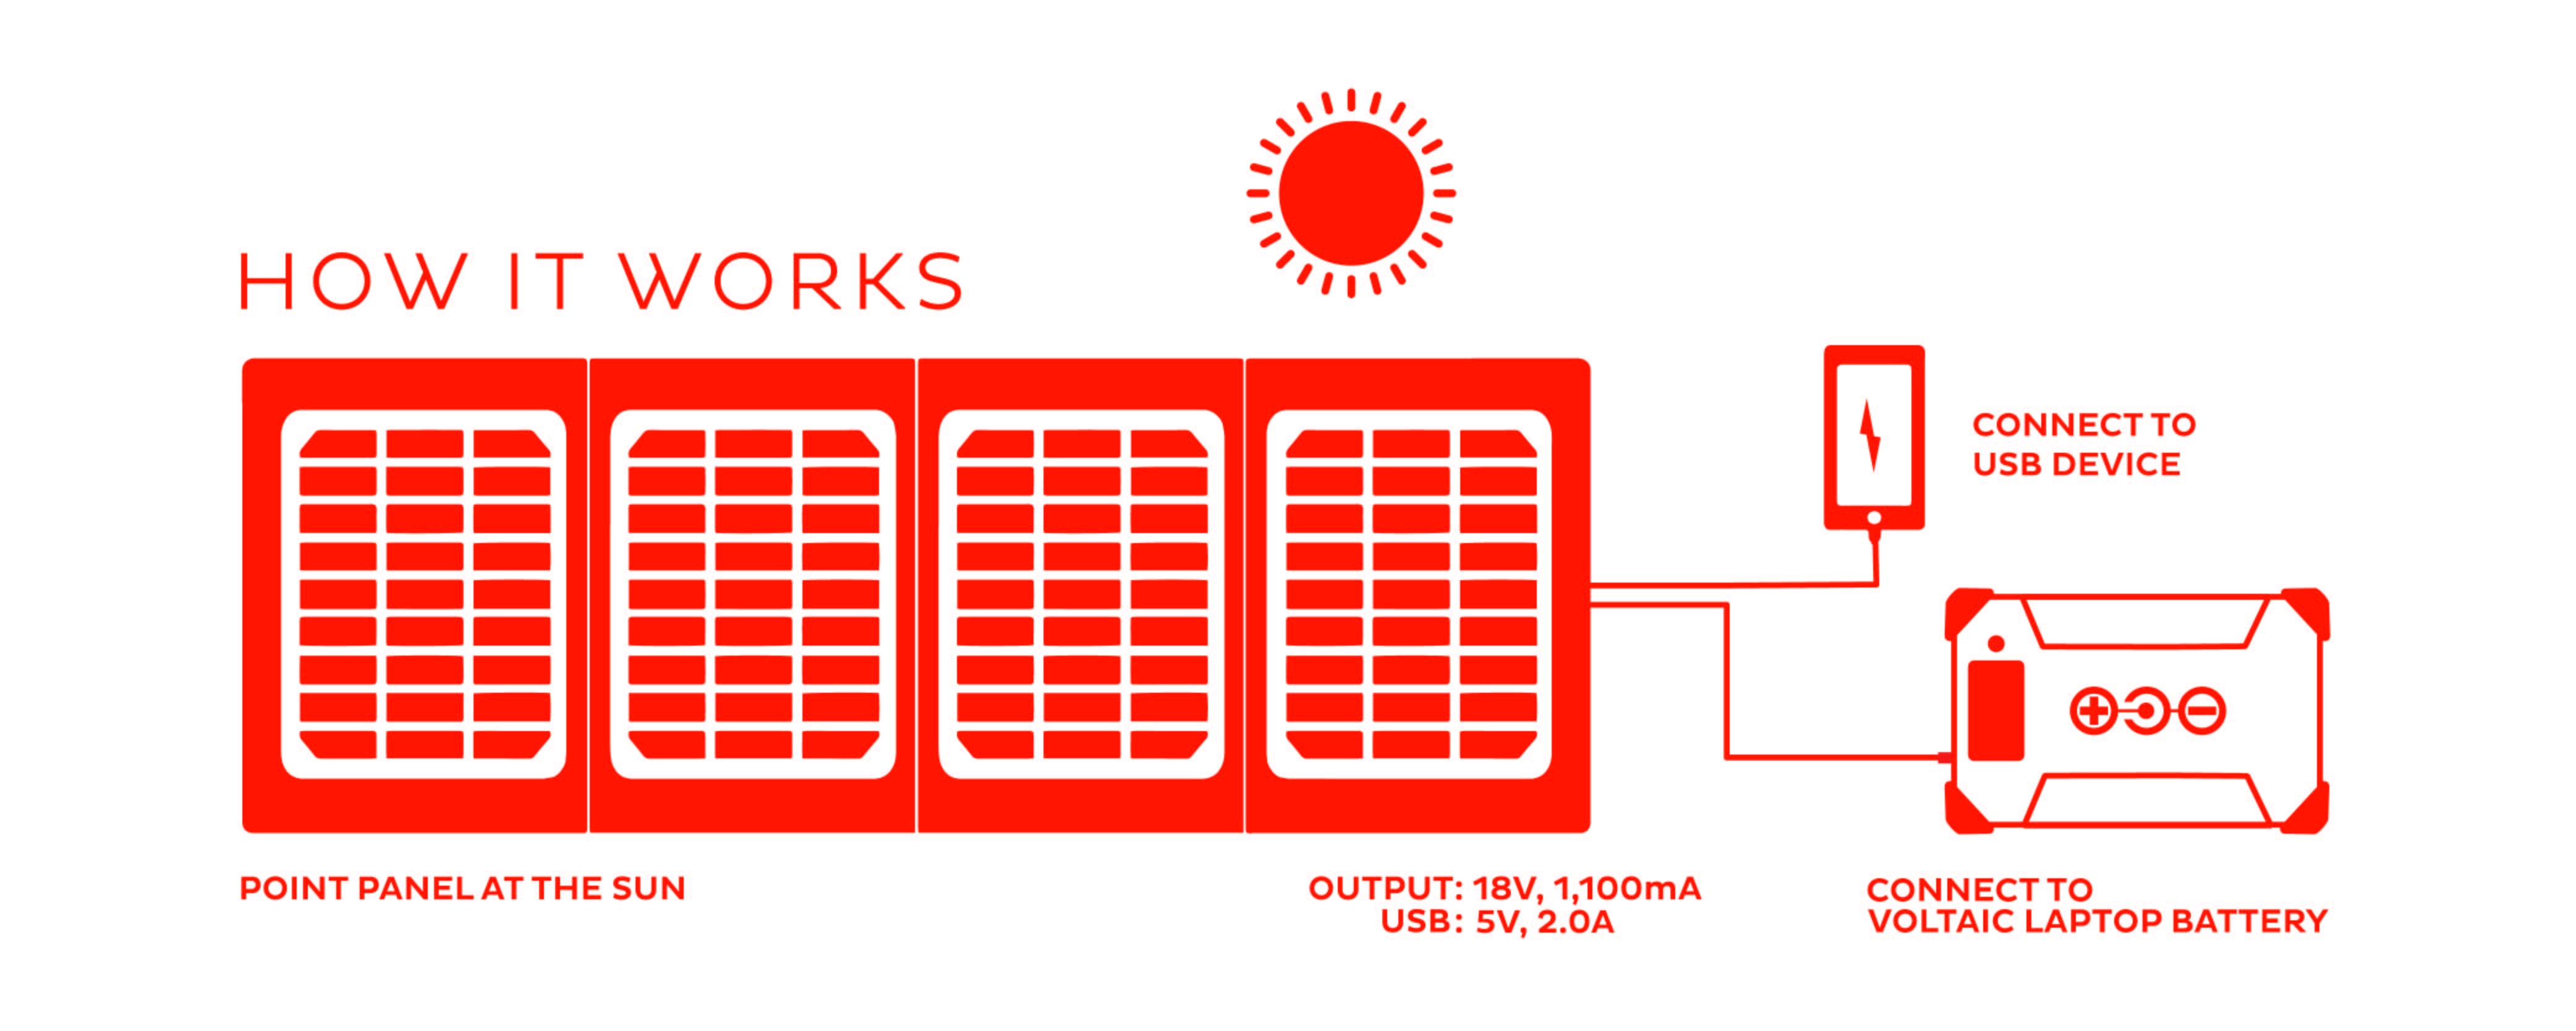 20 Watt solar charger